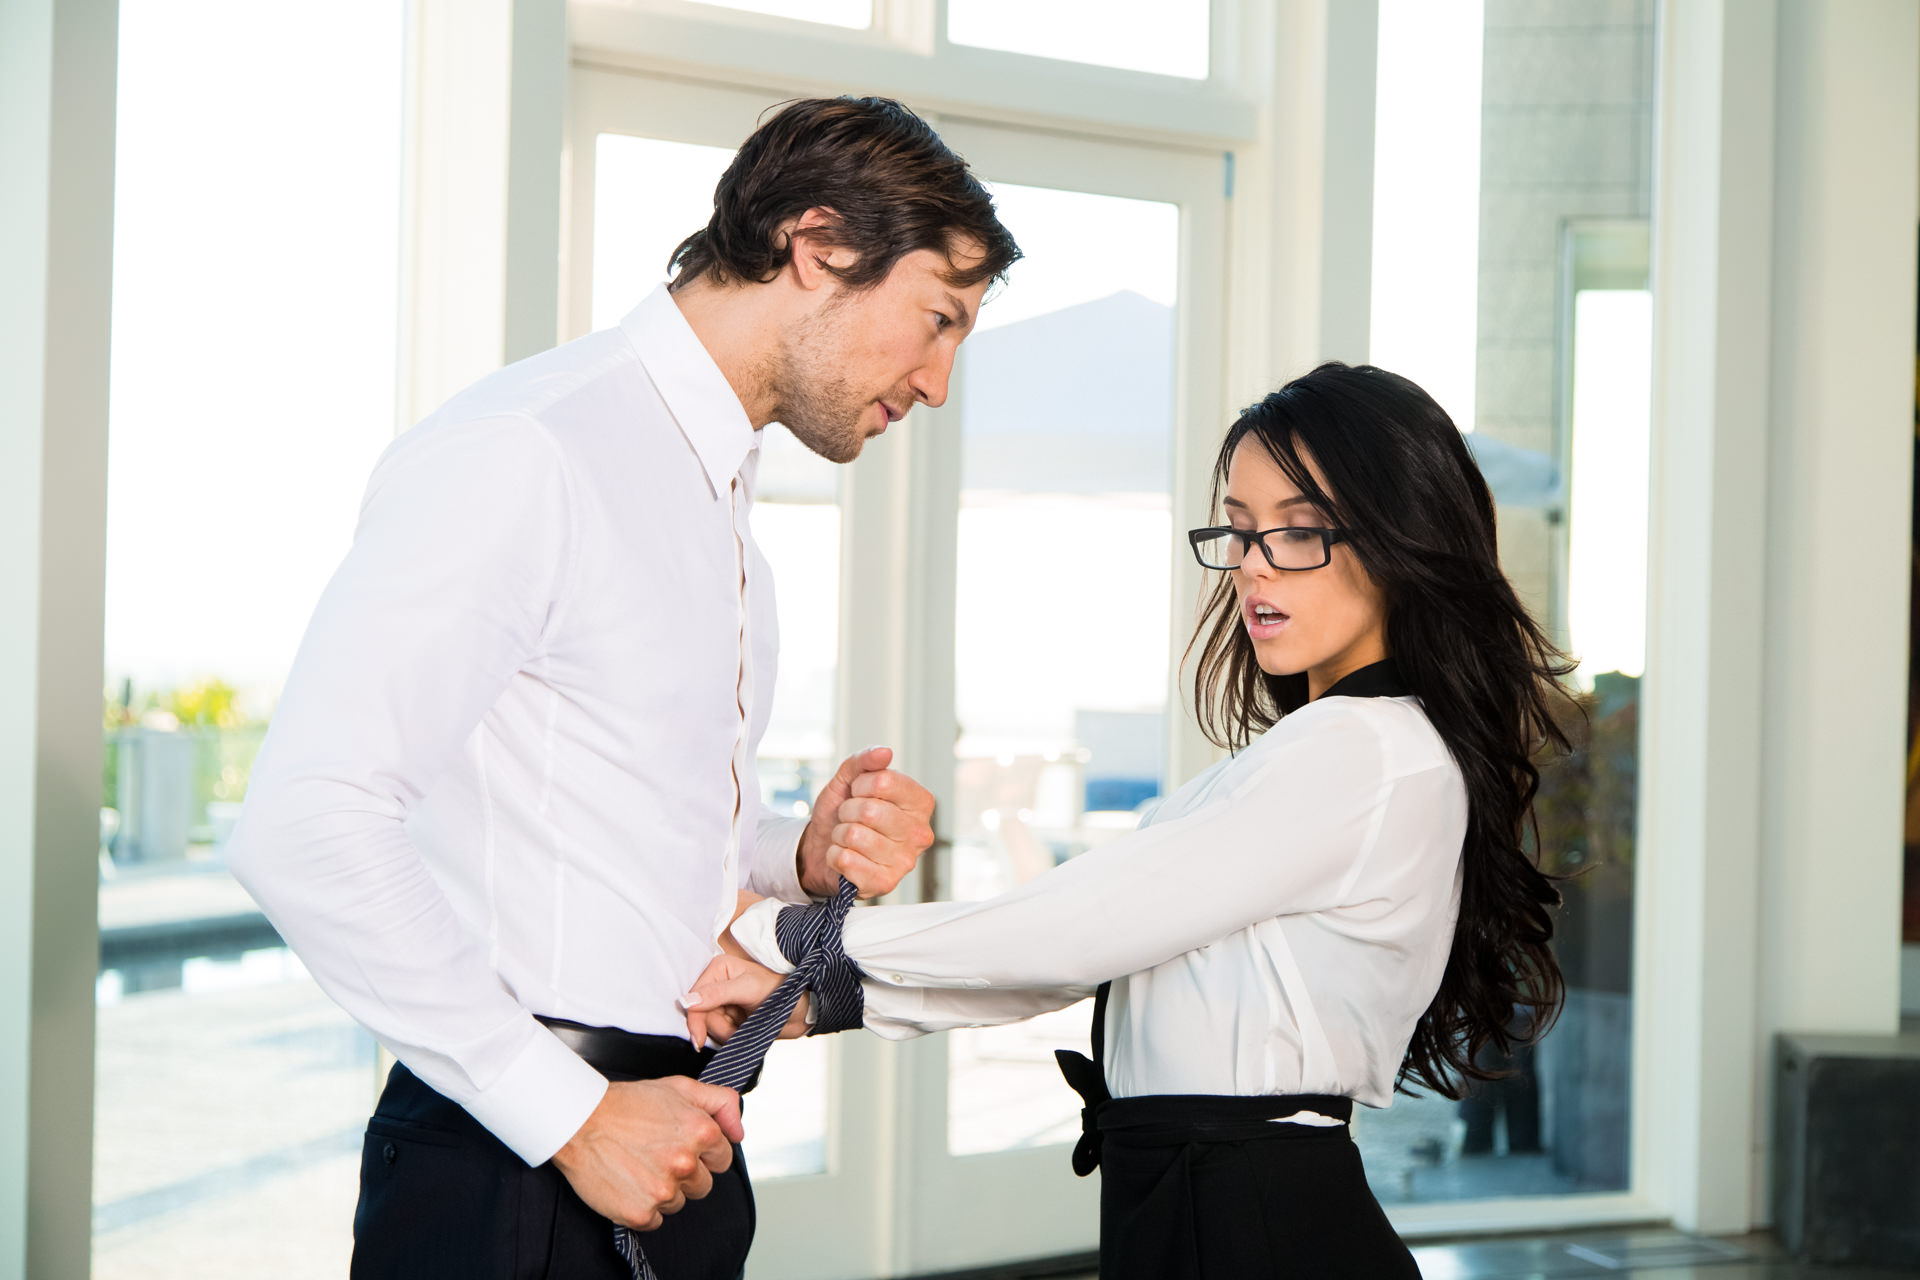 EroticaX – Role Playing- Boss/Secretary – Megan Rain